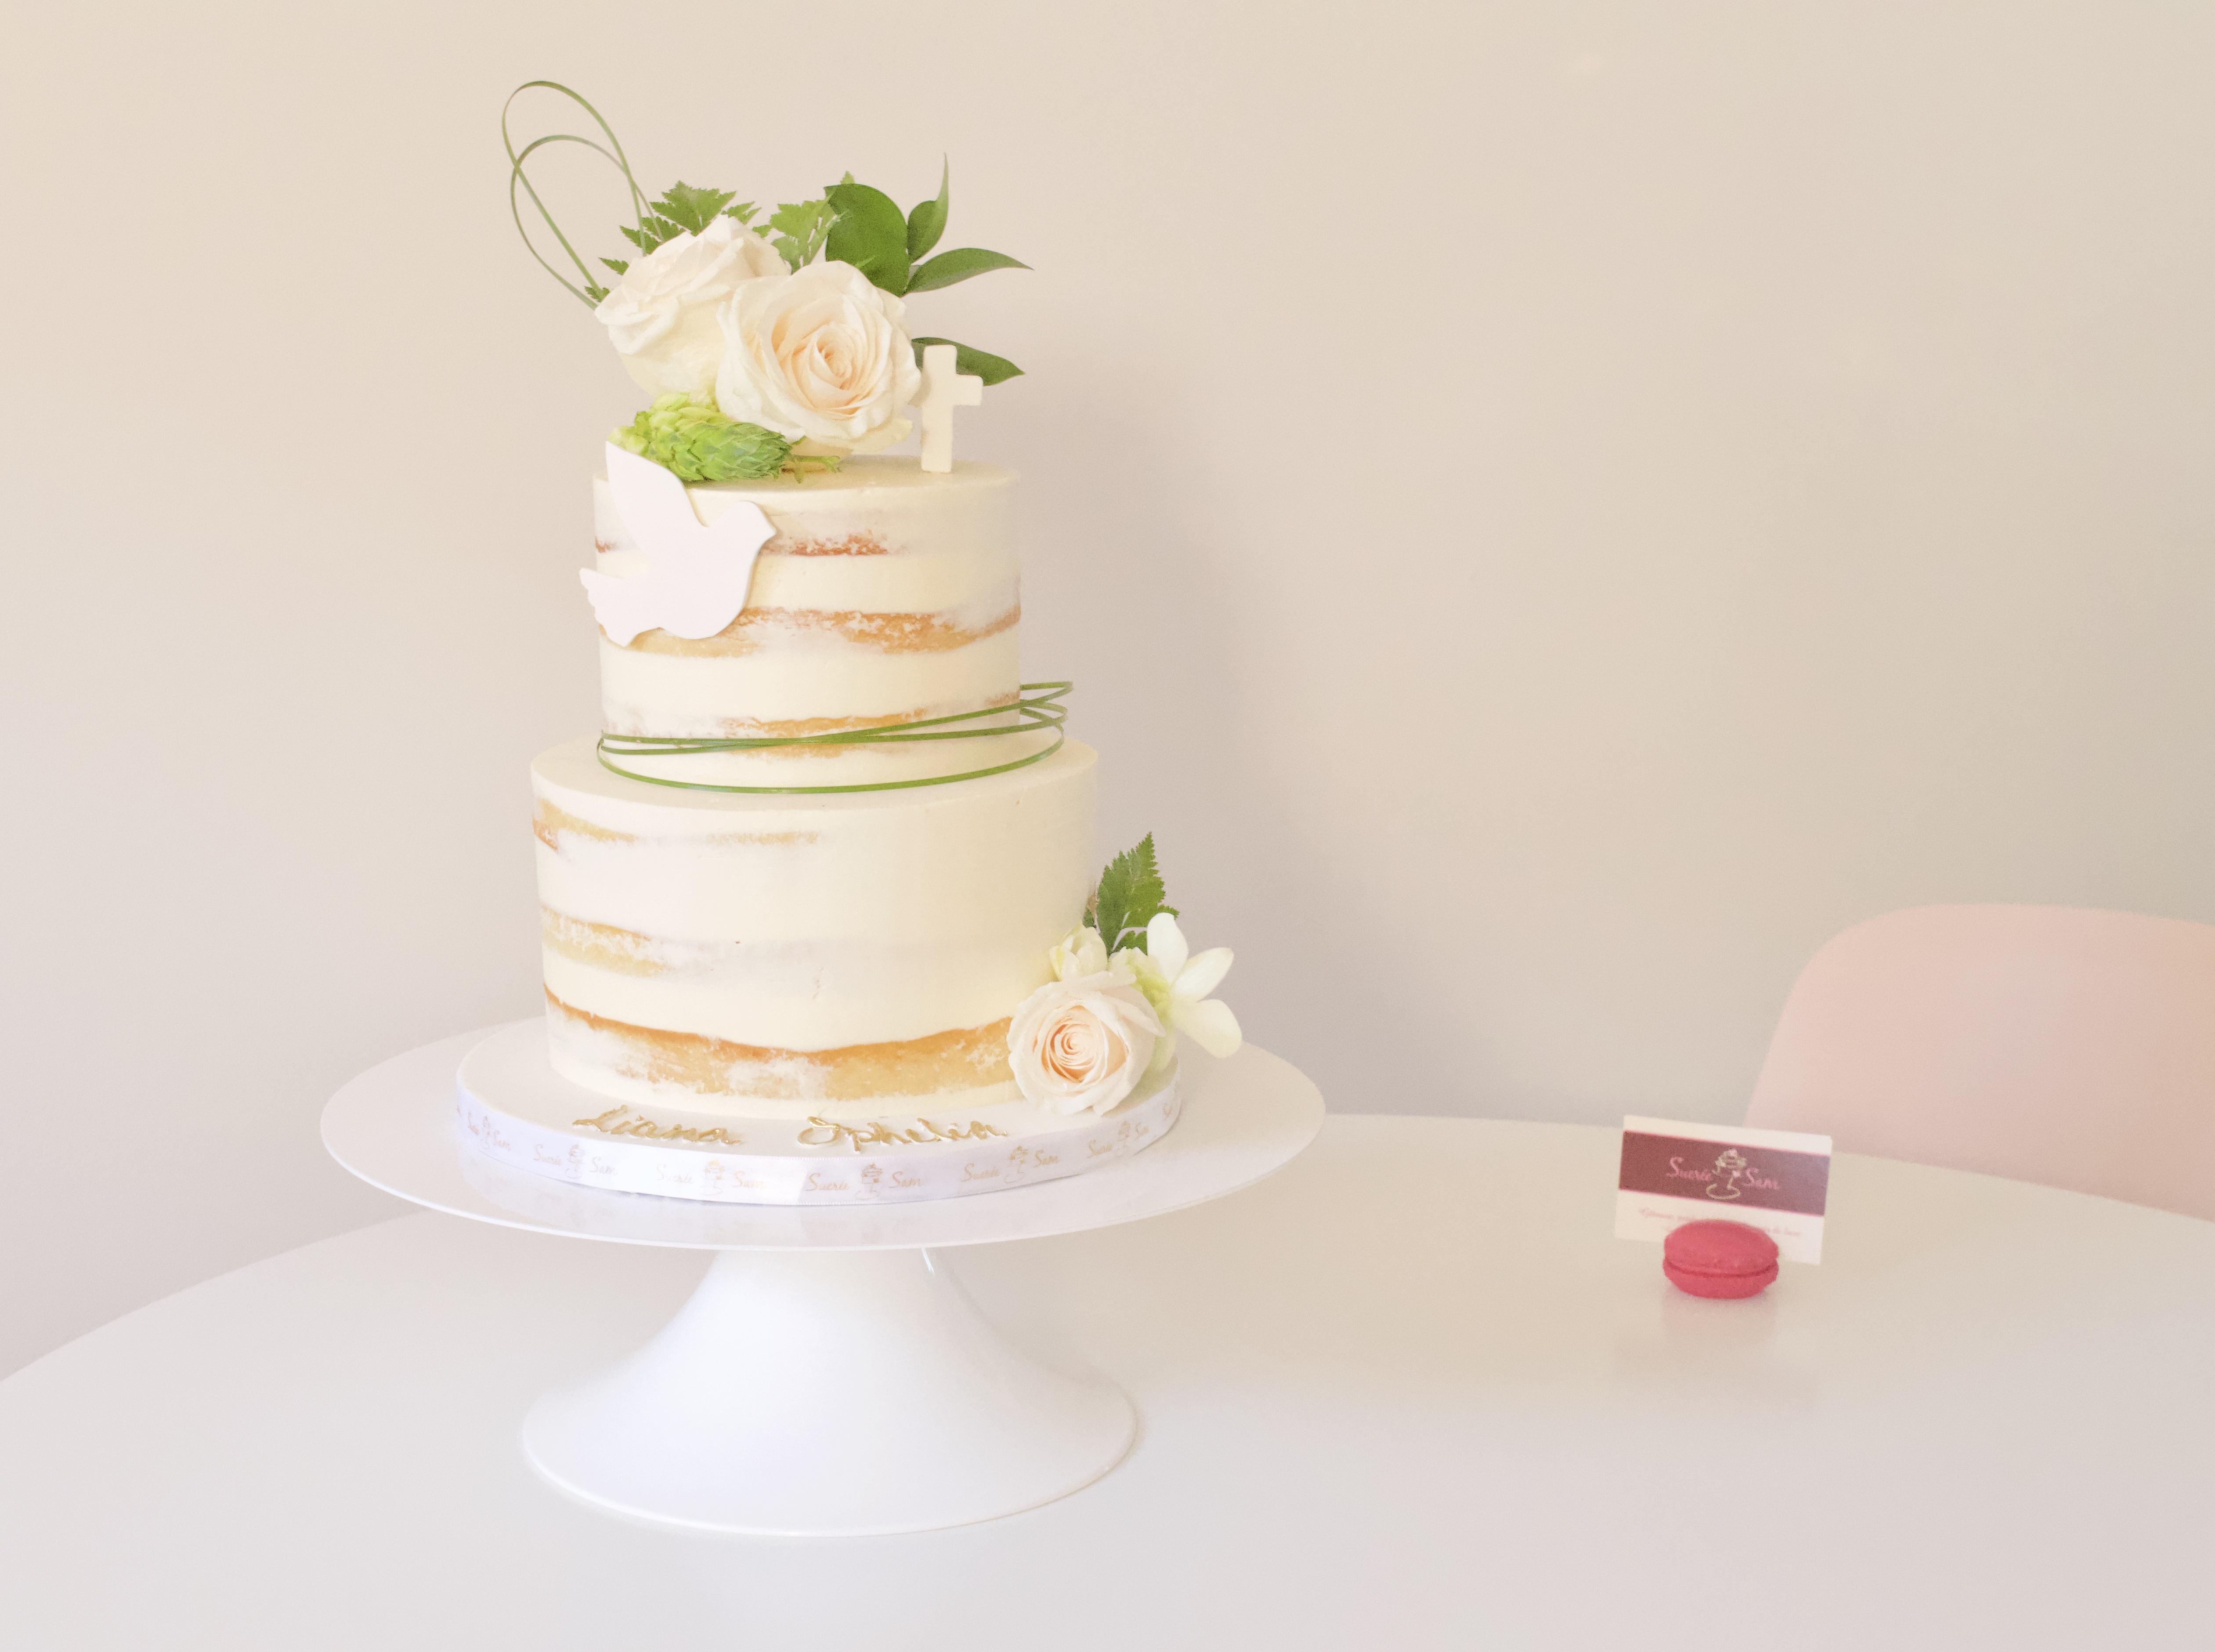 Gâteau religieux